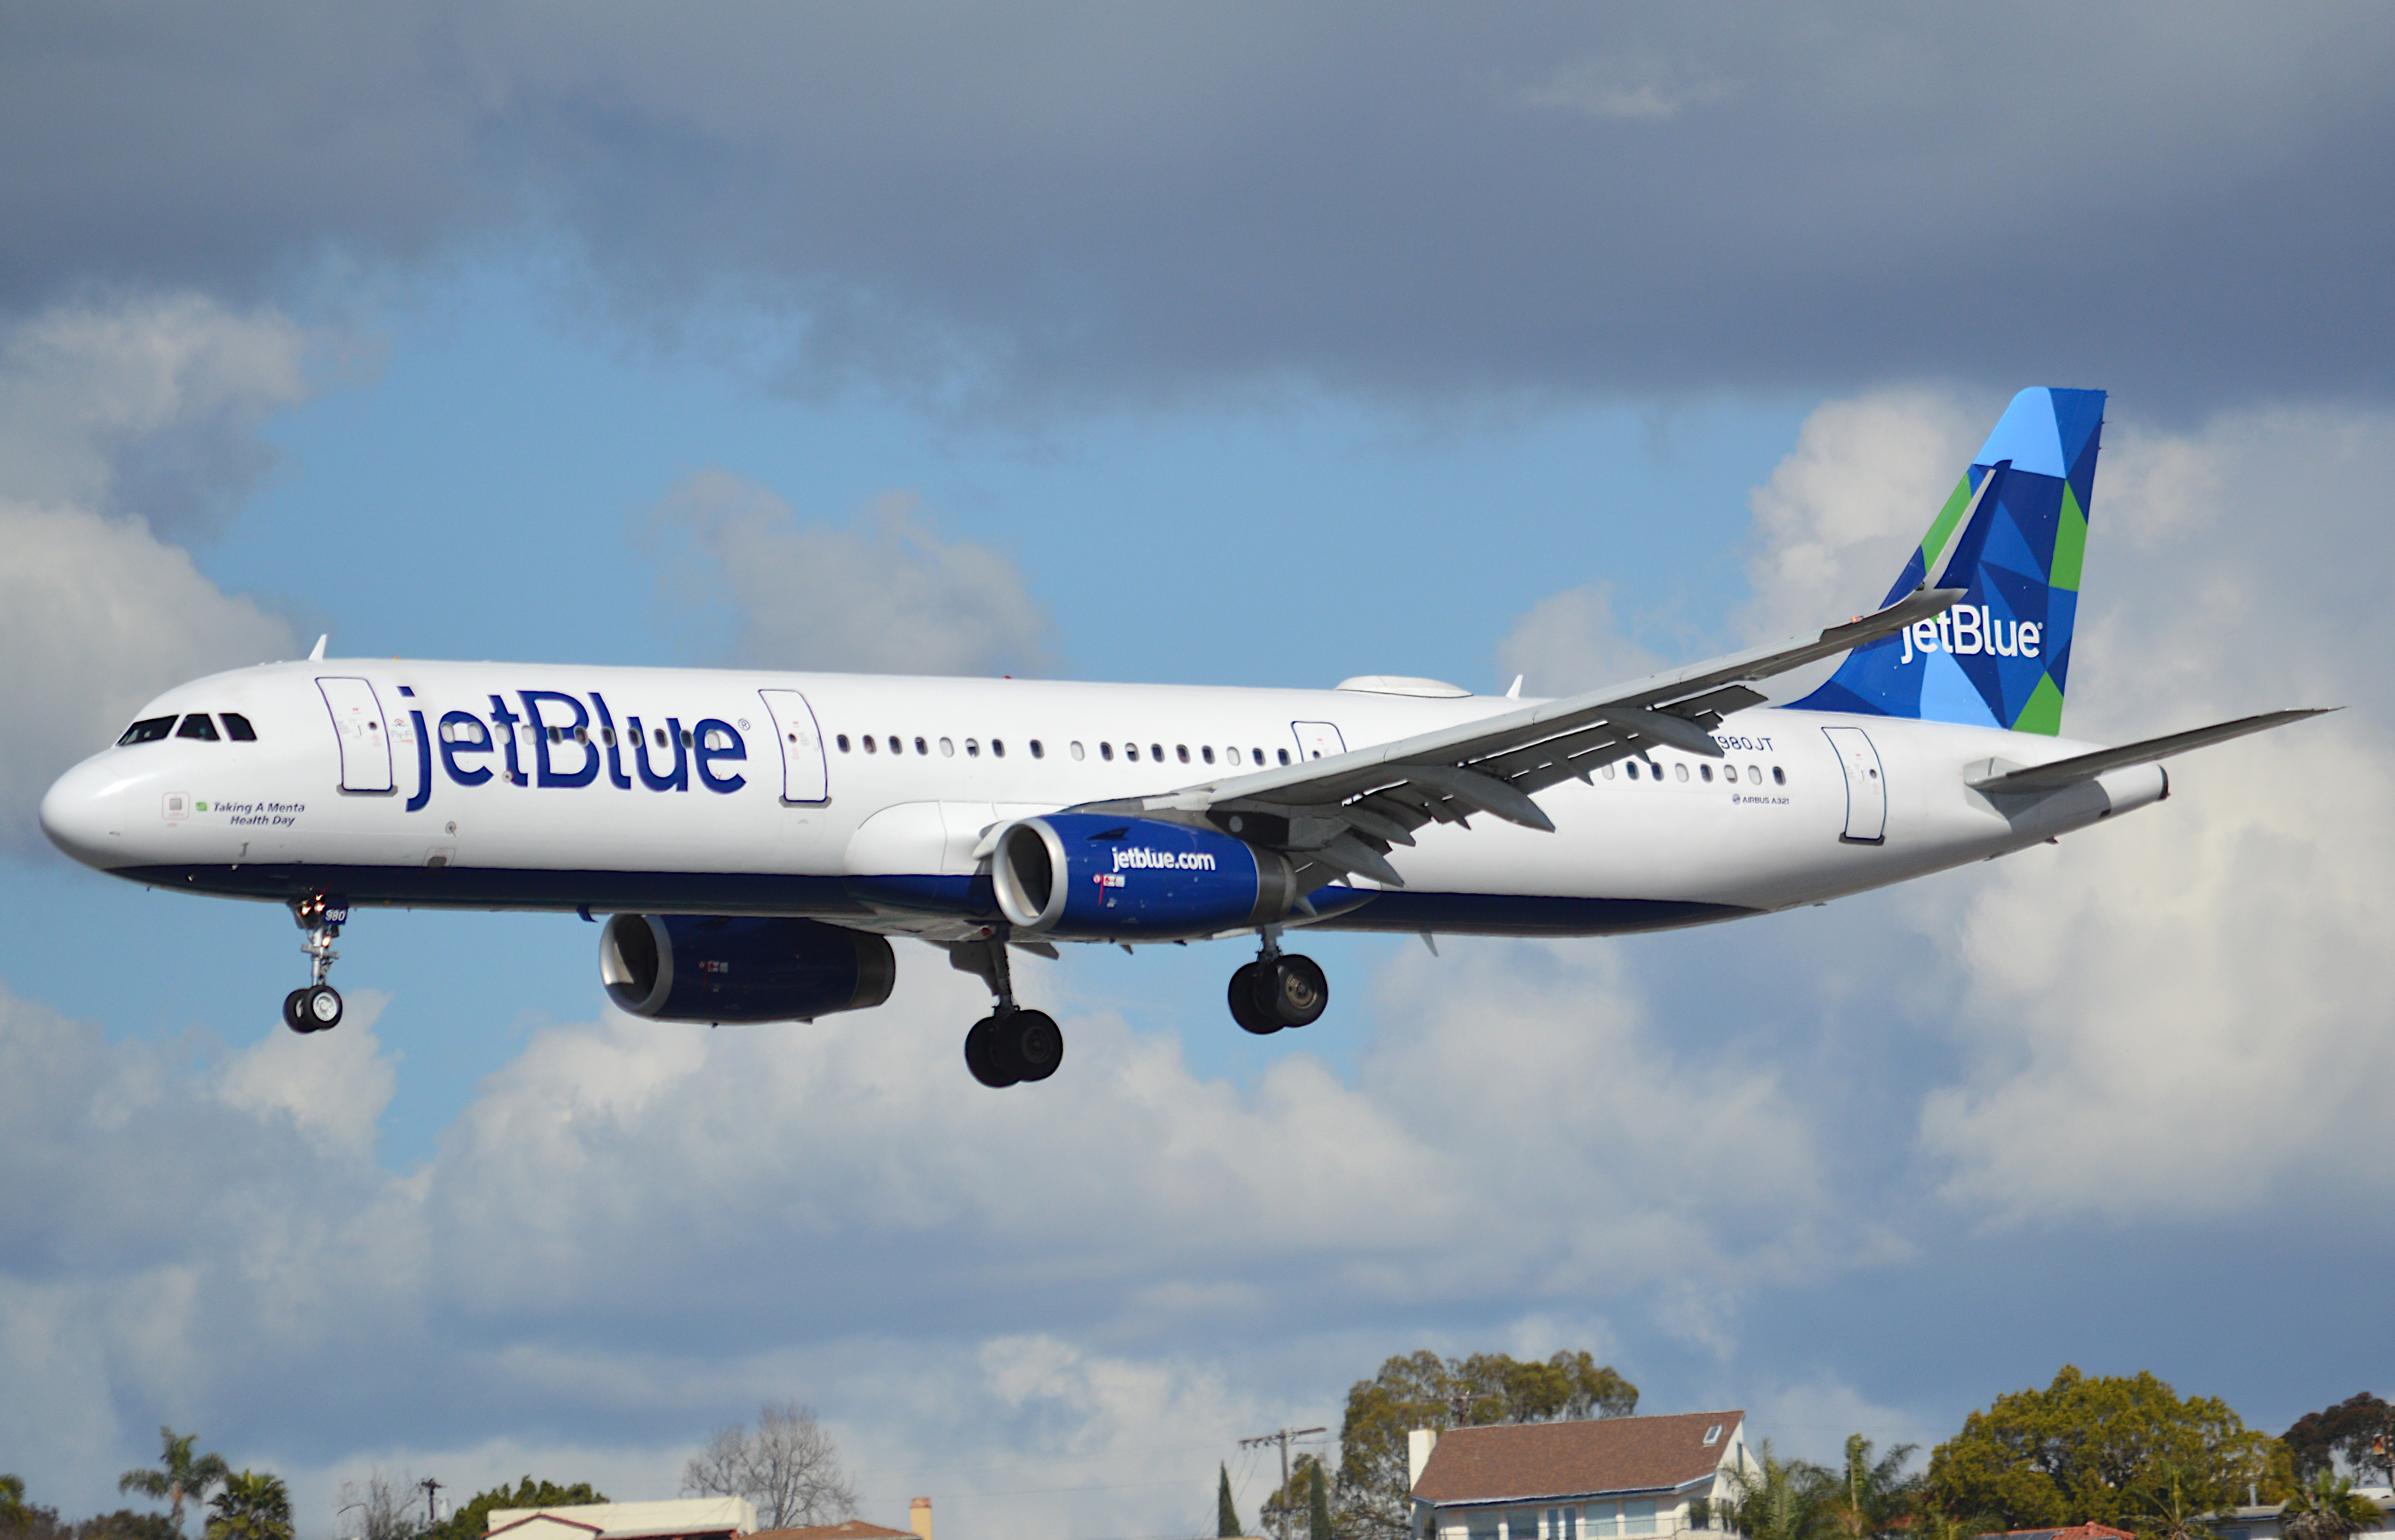 En Airbus A321-200 fra det amerikanske lavprisflyselskab JetBlue. Foto: Johnnyw3